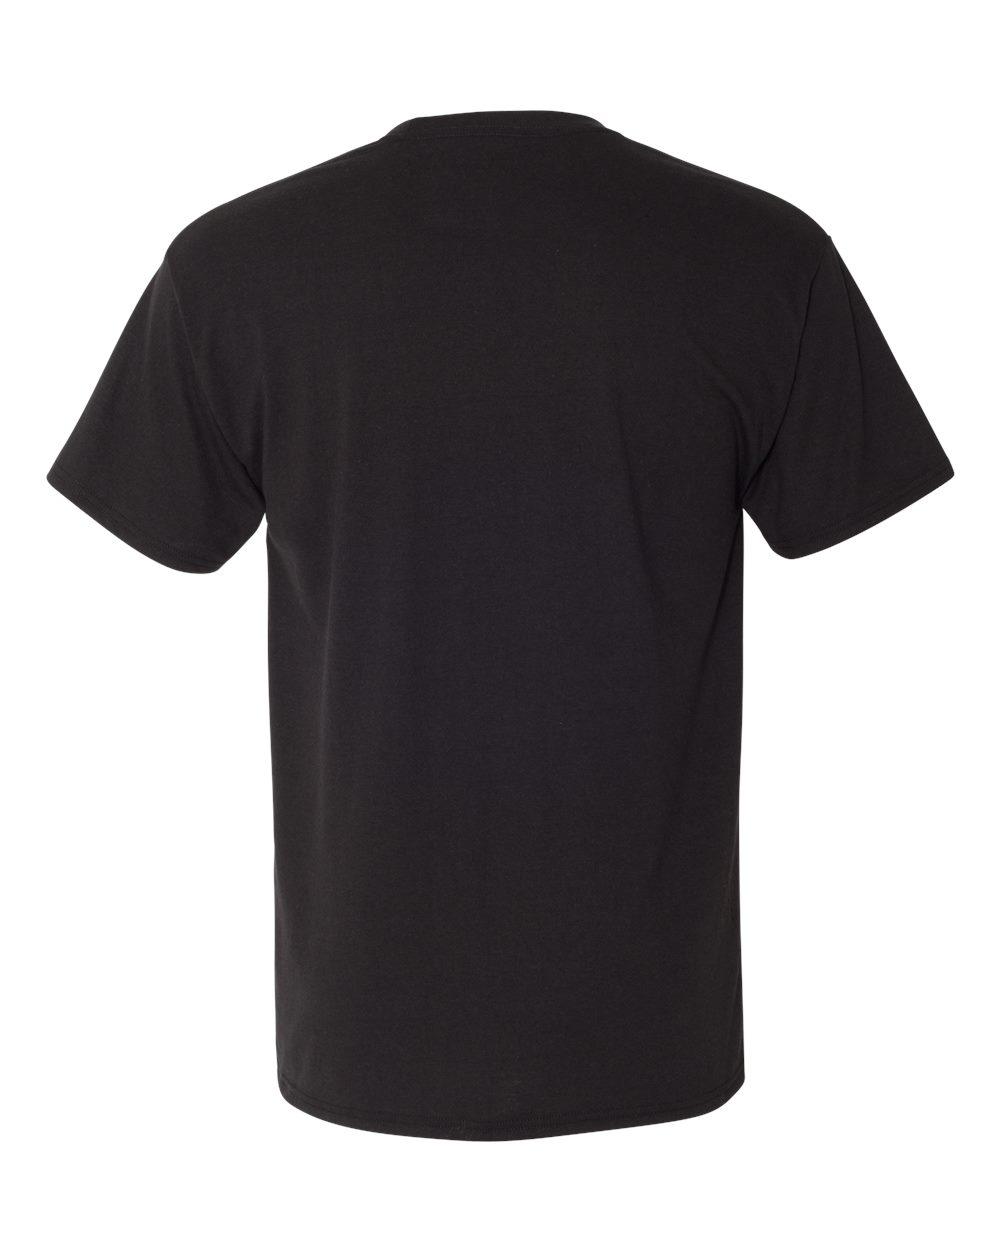 Hanes-Men-039-s-X-Temp-Triblend-T-Shirt-With-Fresh-Iq-42TB-S-3XL thumbnail 4